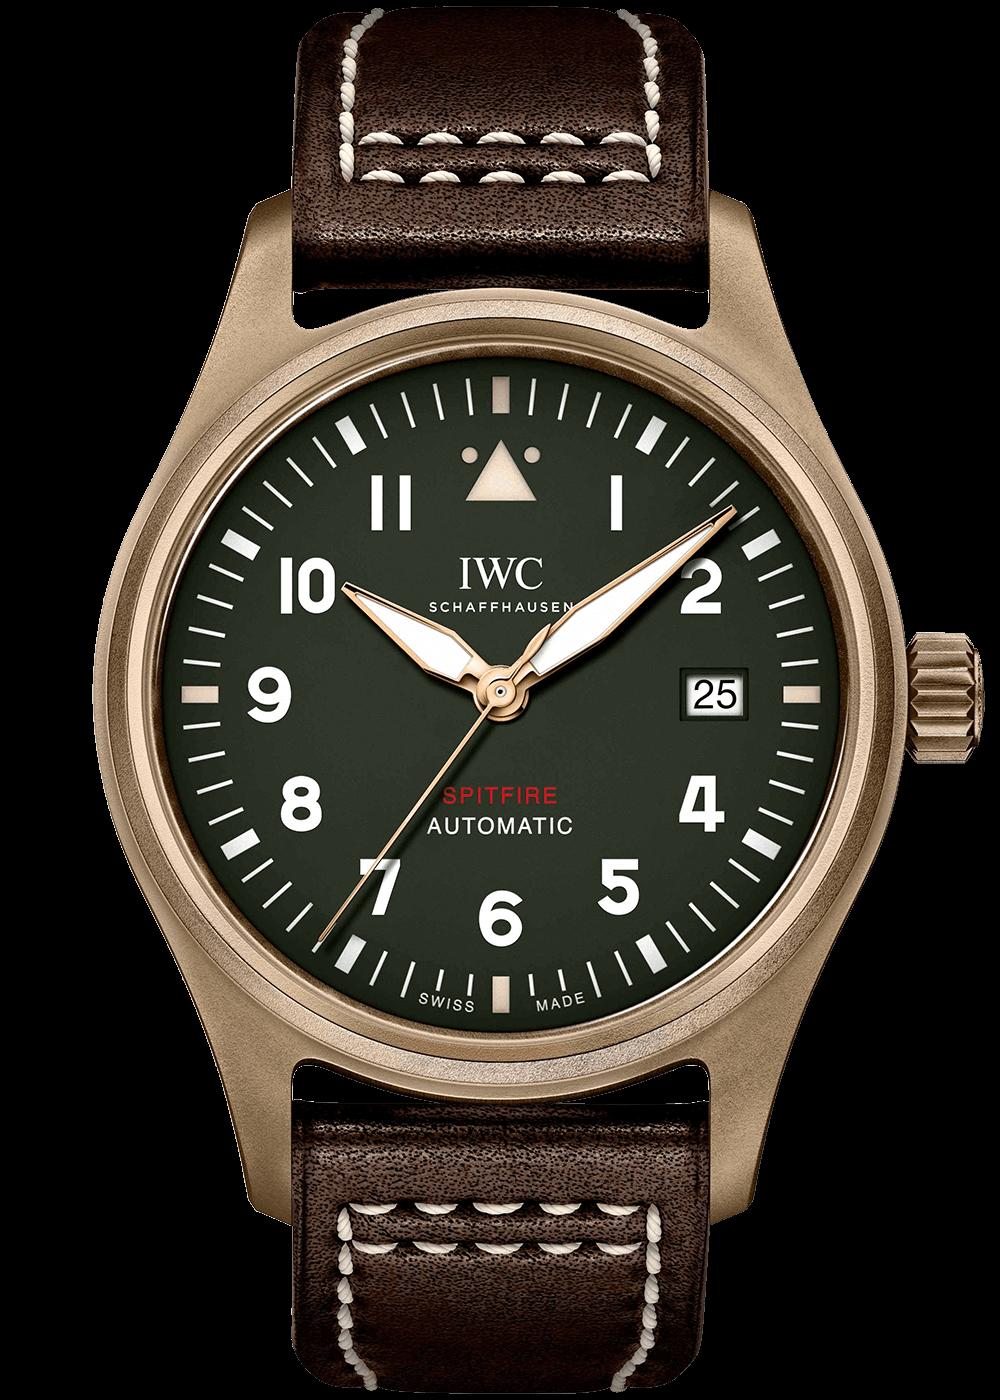 IWC Pilot SpitFire Automatic Bronze